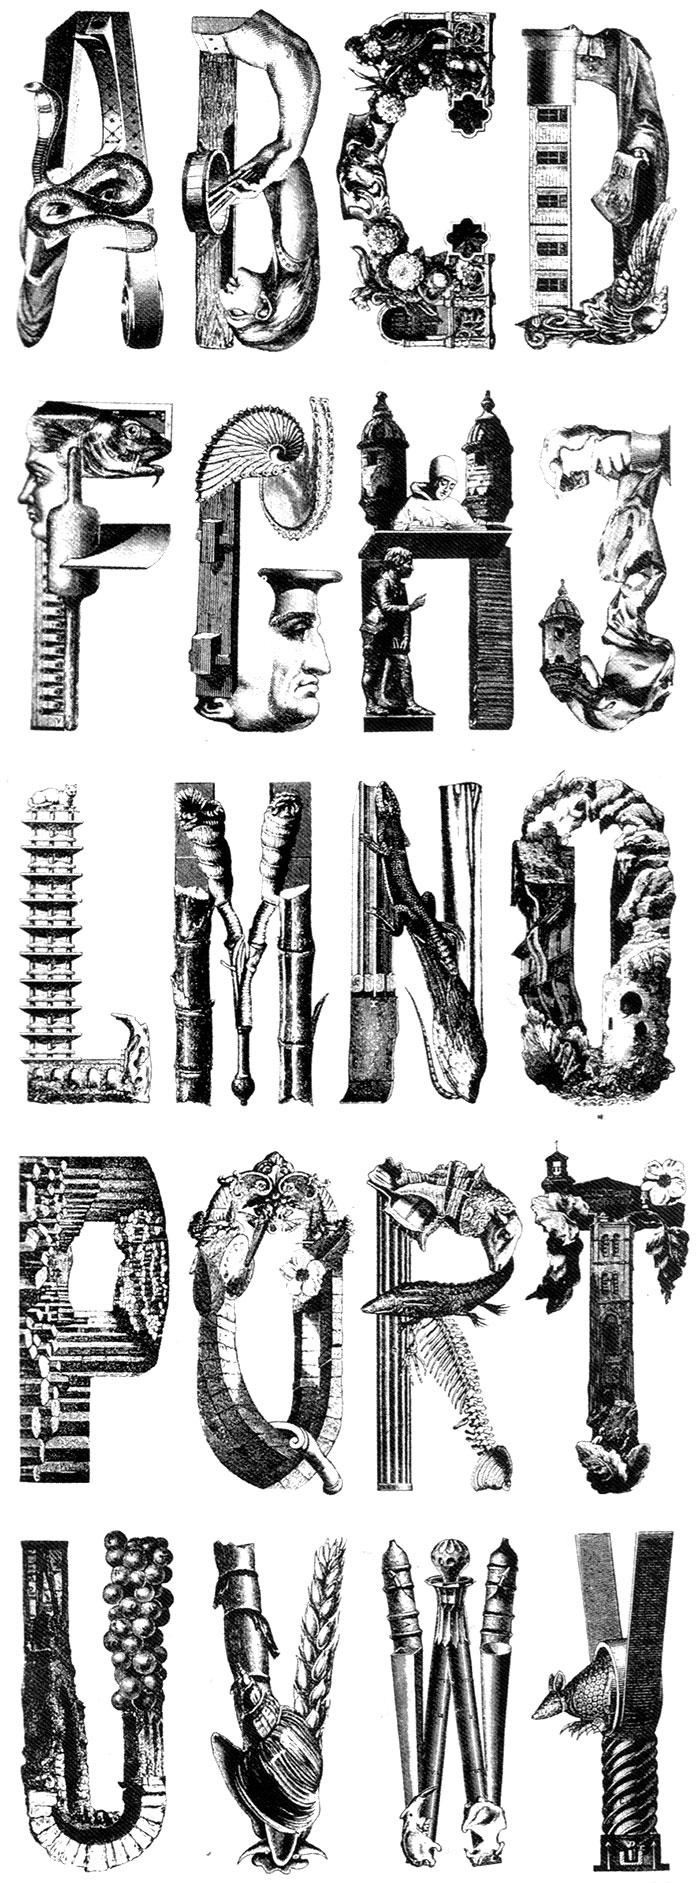 Roman-Cieslewicz-alphabet-1964-guide-de-la-france-mysterieuse